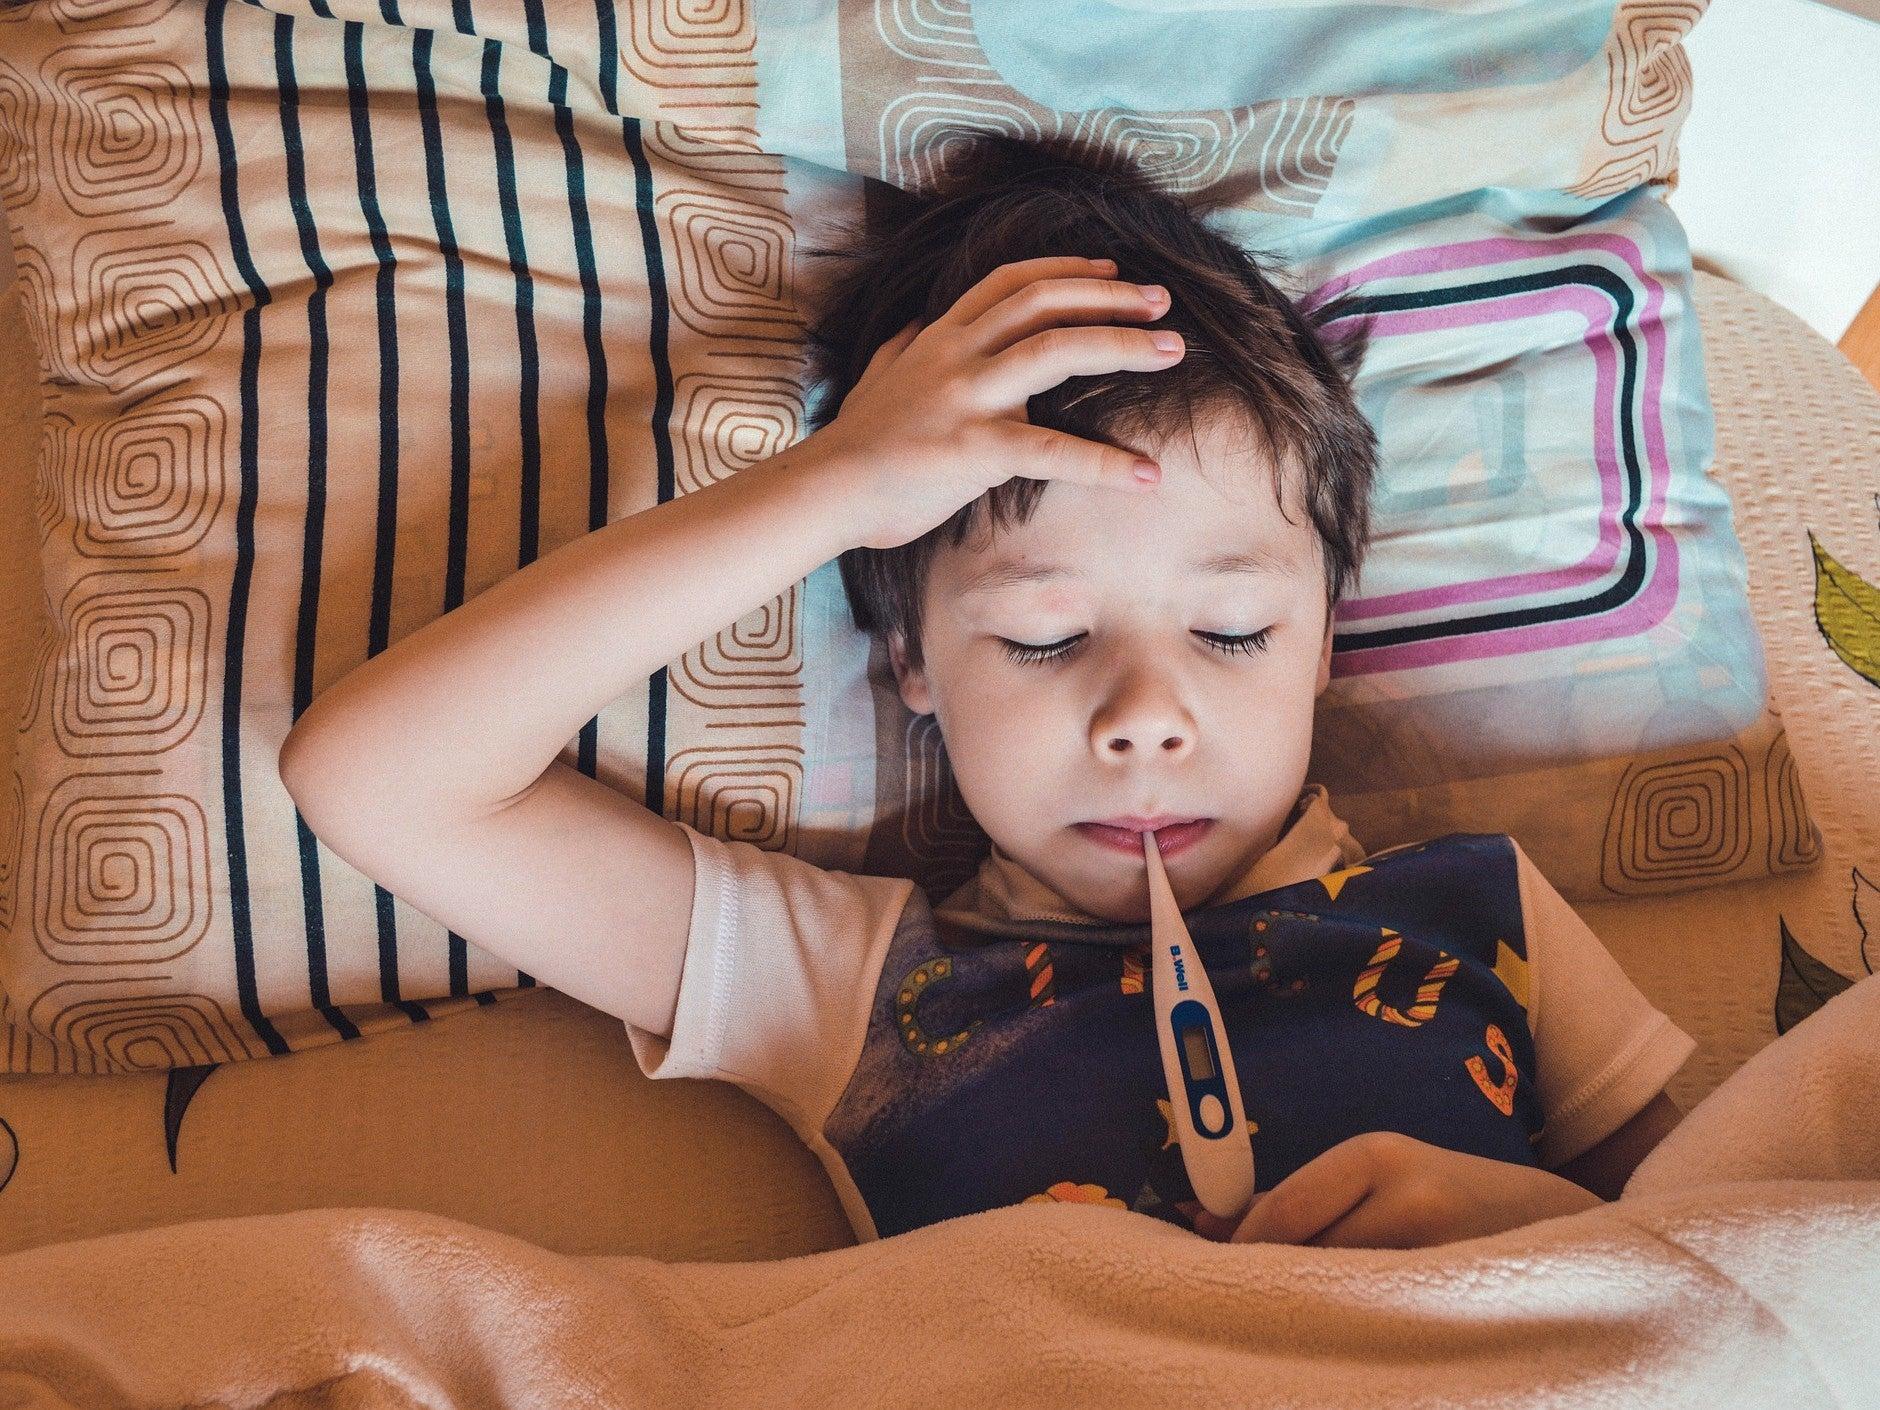 a kid sick in bed having his temperature taken